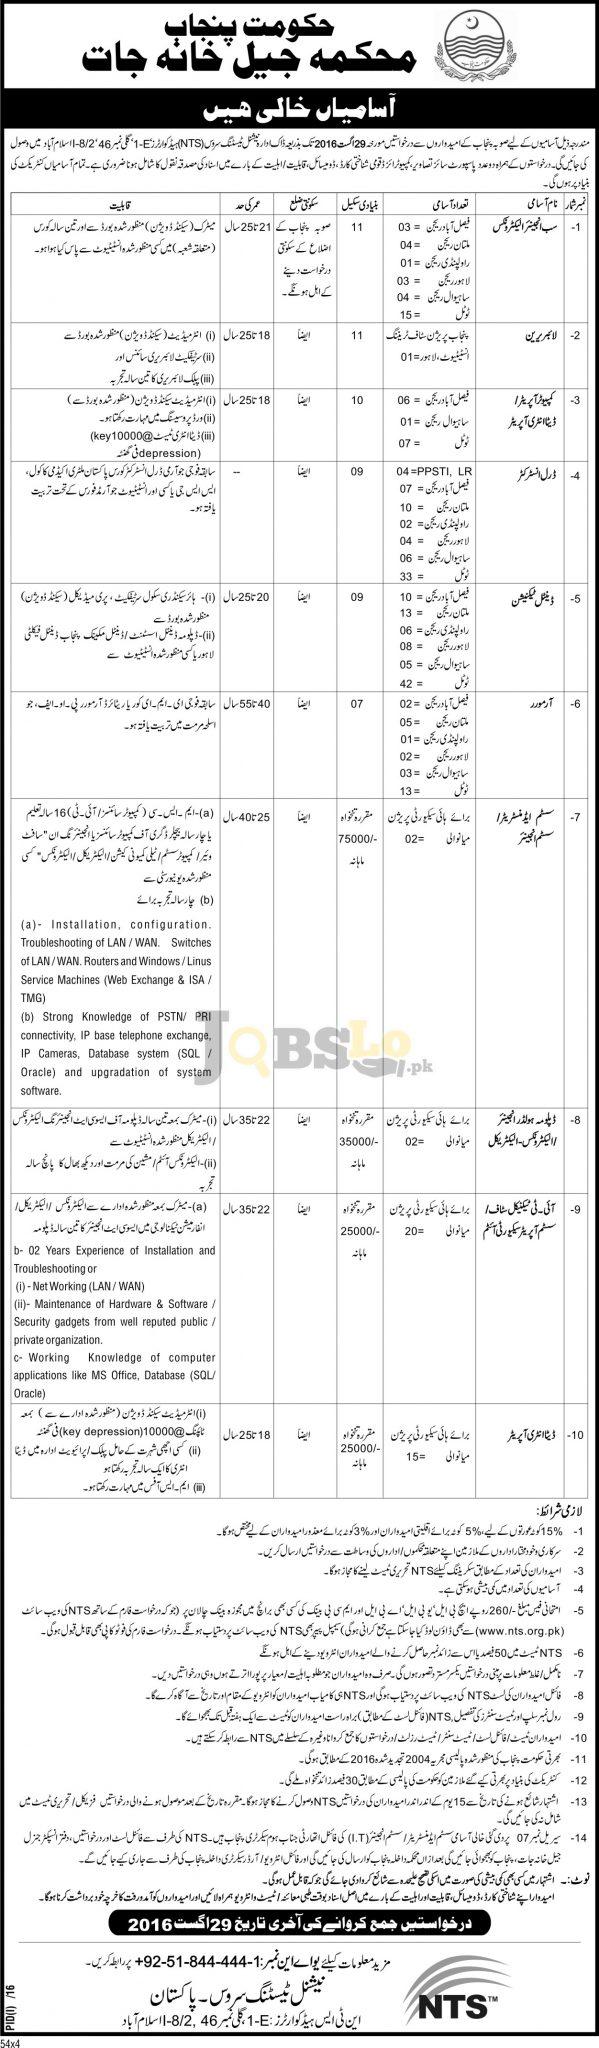 Punjab Jail Department Jobs August 2016 NTS Test & Online Form Download